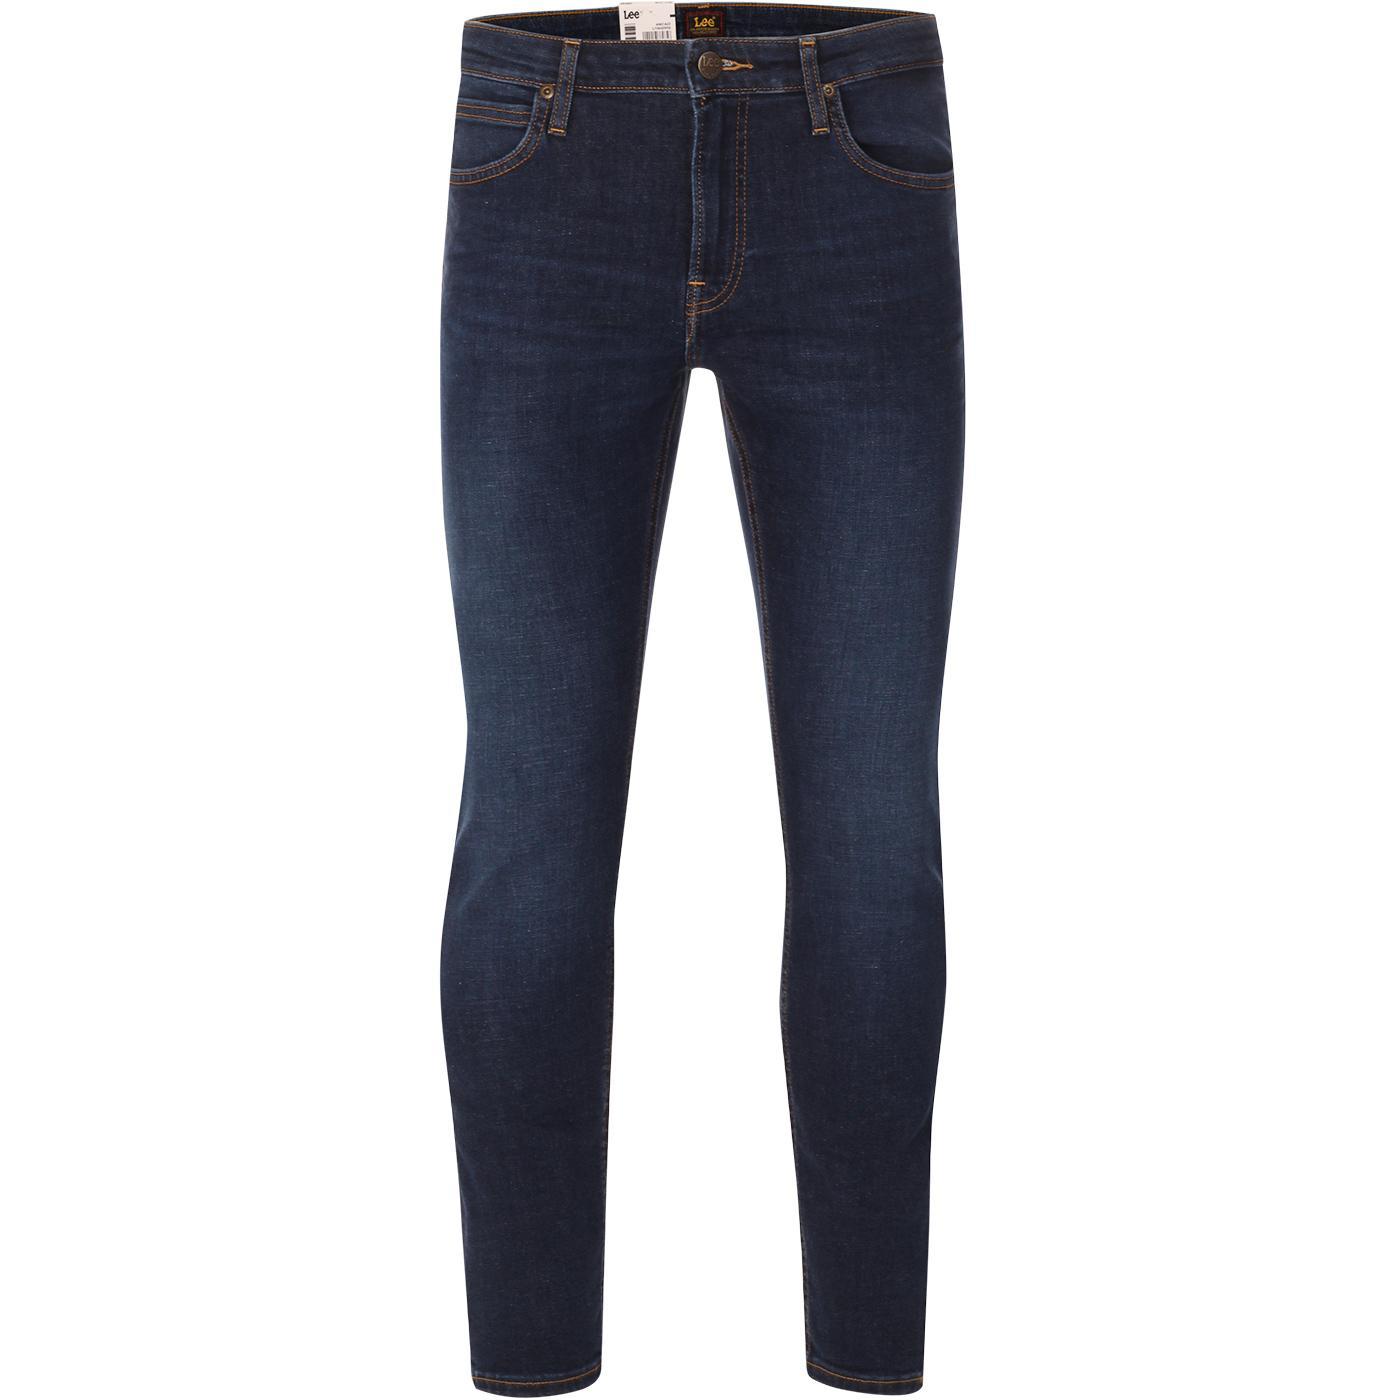 Malone LEE JEANS Mod Indigo Skinny Drainpipe Jeans